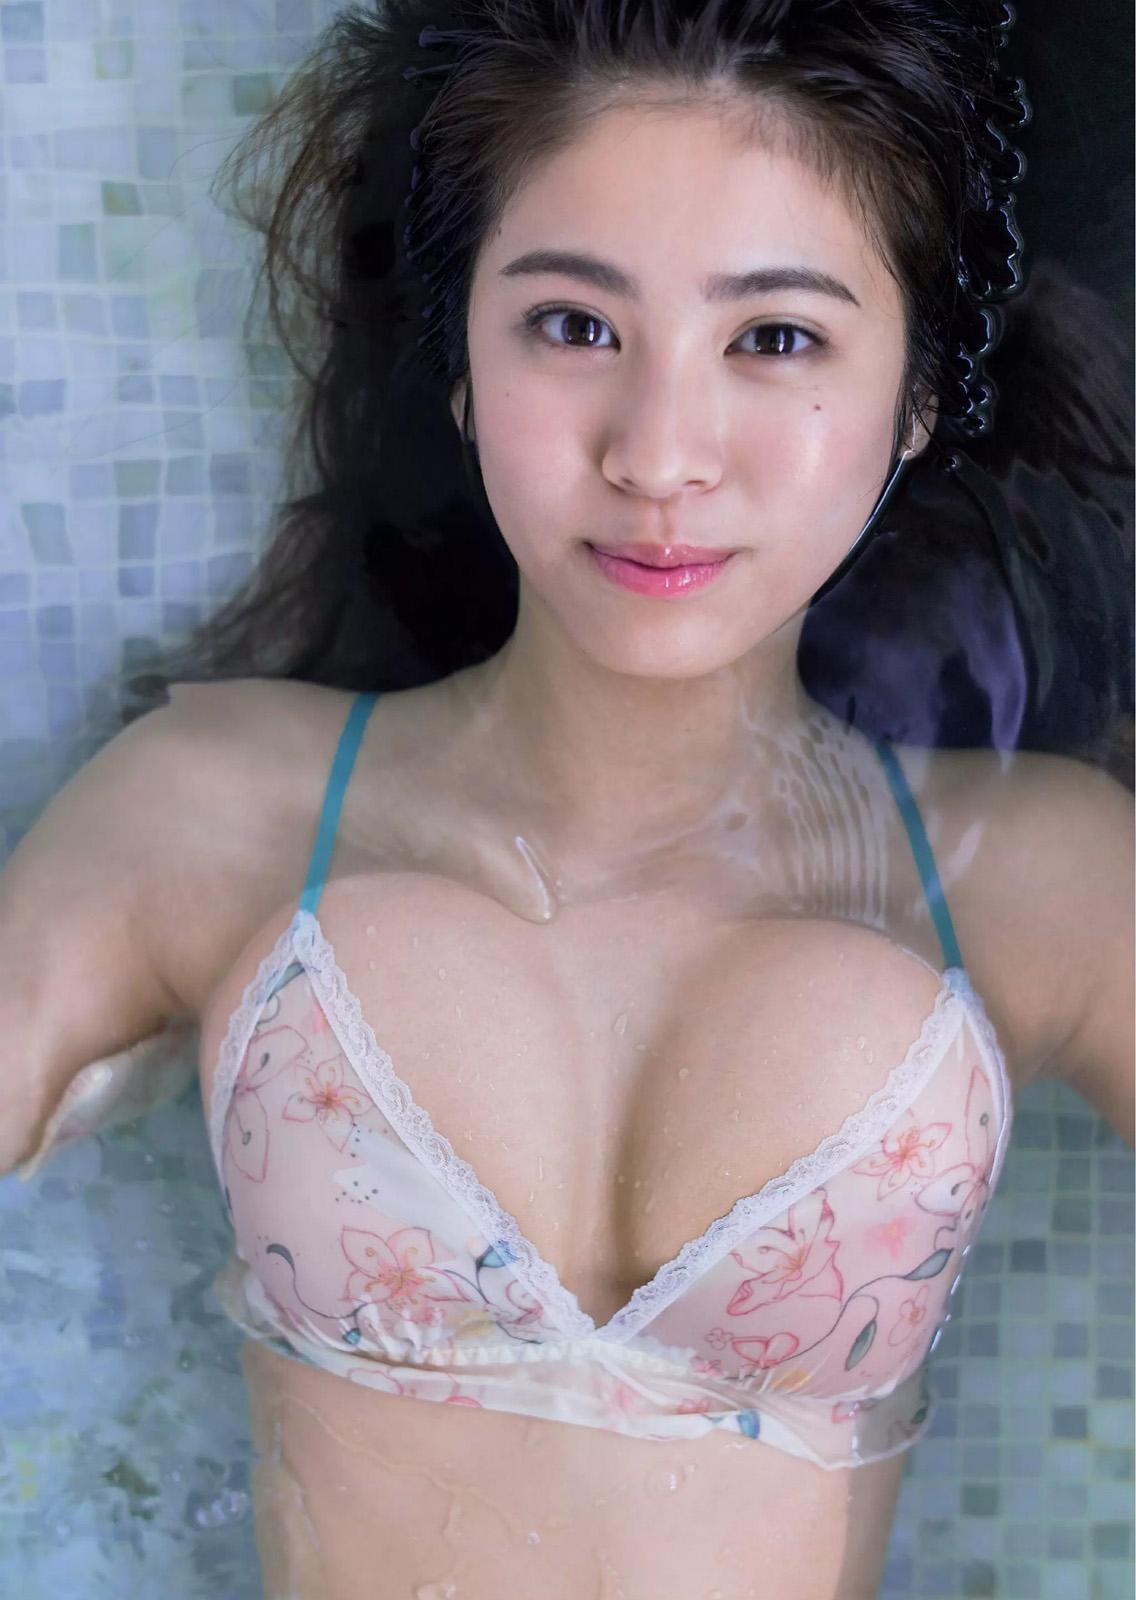 Runa Sawakita 澤北るな, Weekly Playboy 2017 No.37 (週刊プレイボーイ 2017年37号)